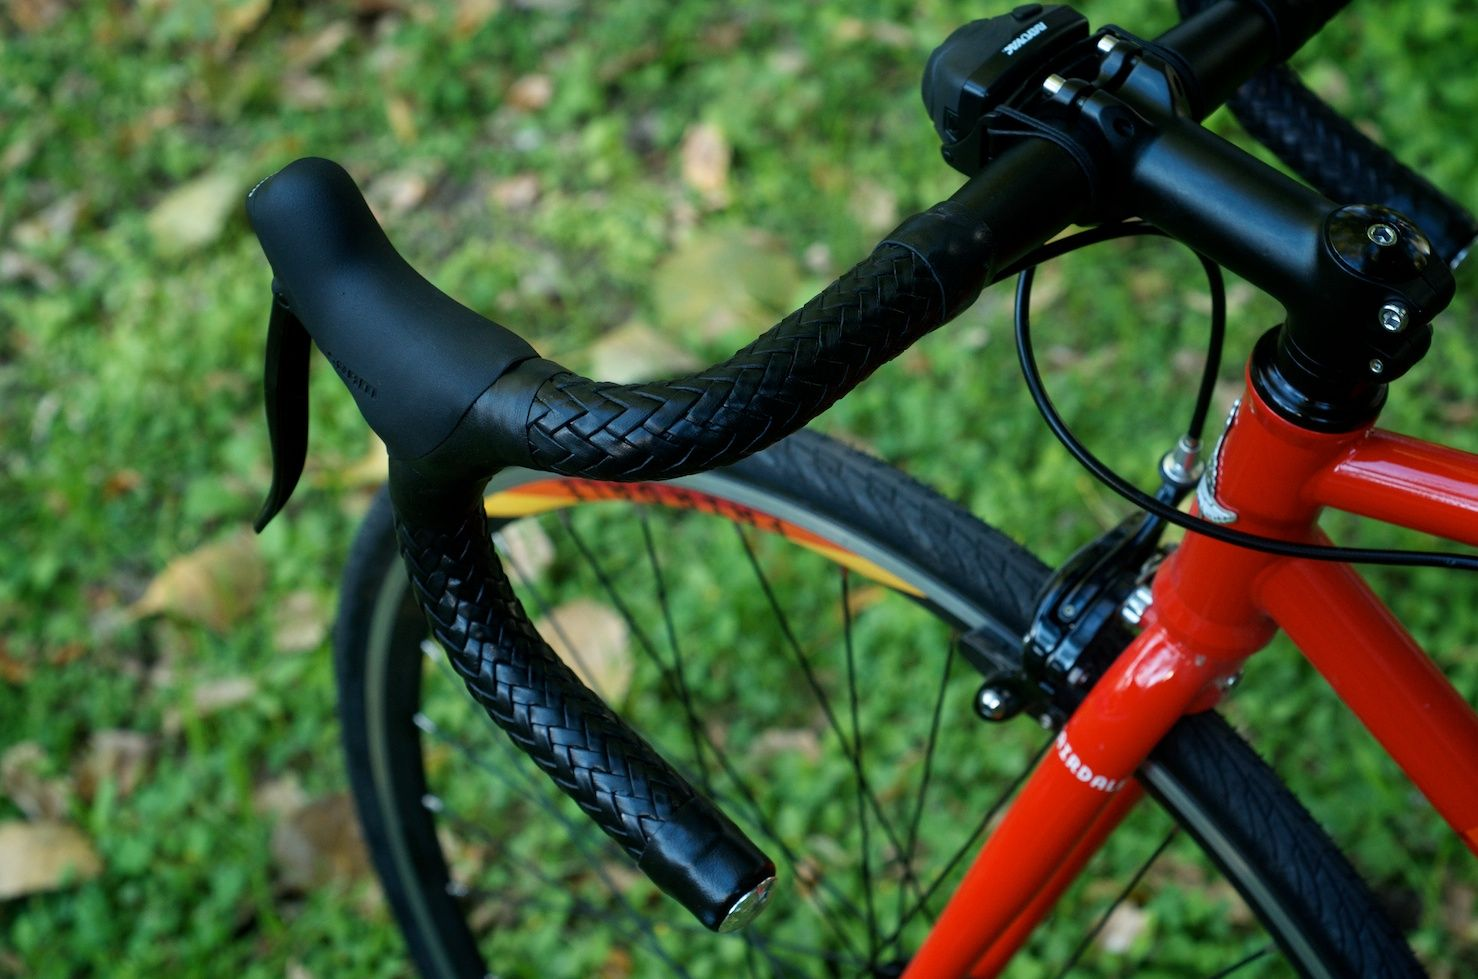 Twill Weave Carbon Fiber Drop Bar Bicycle Carbon Road Bike Handlebar Bar Tape